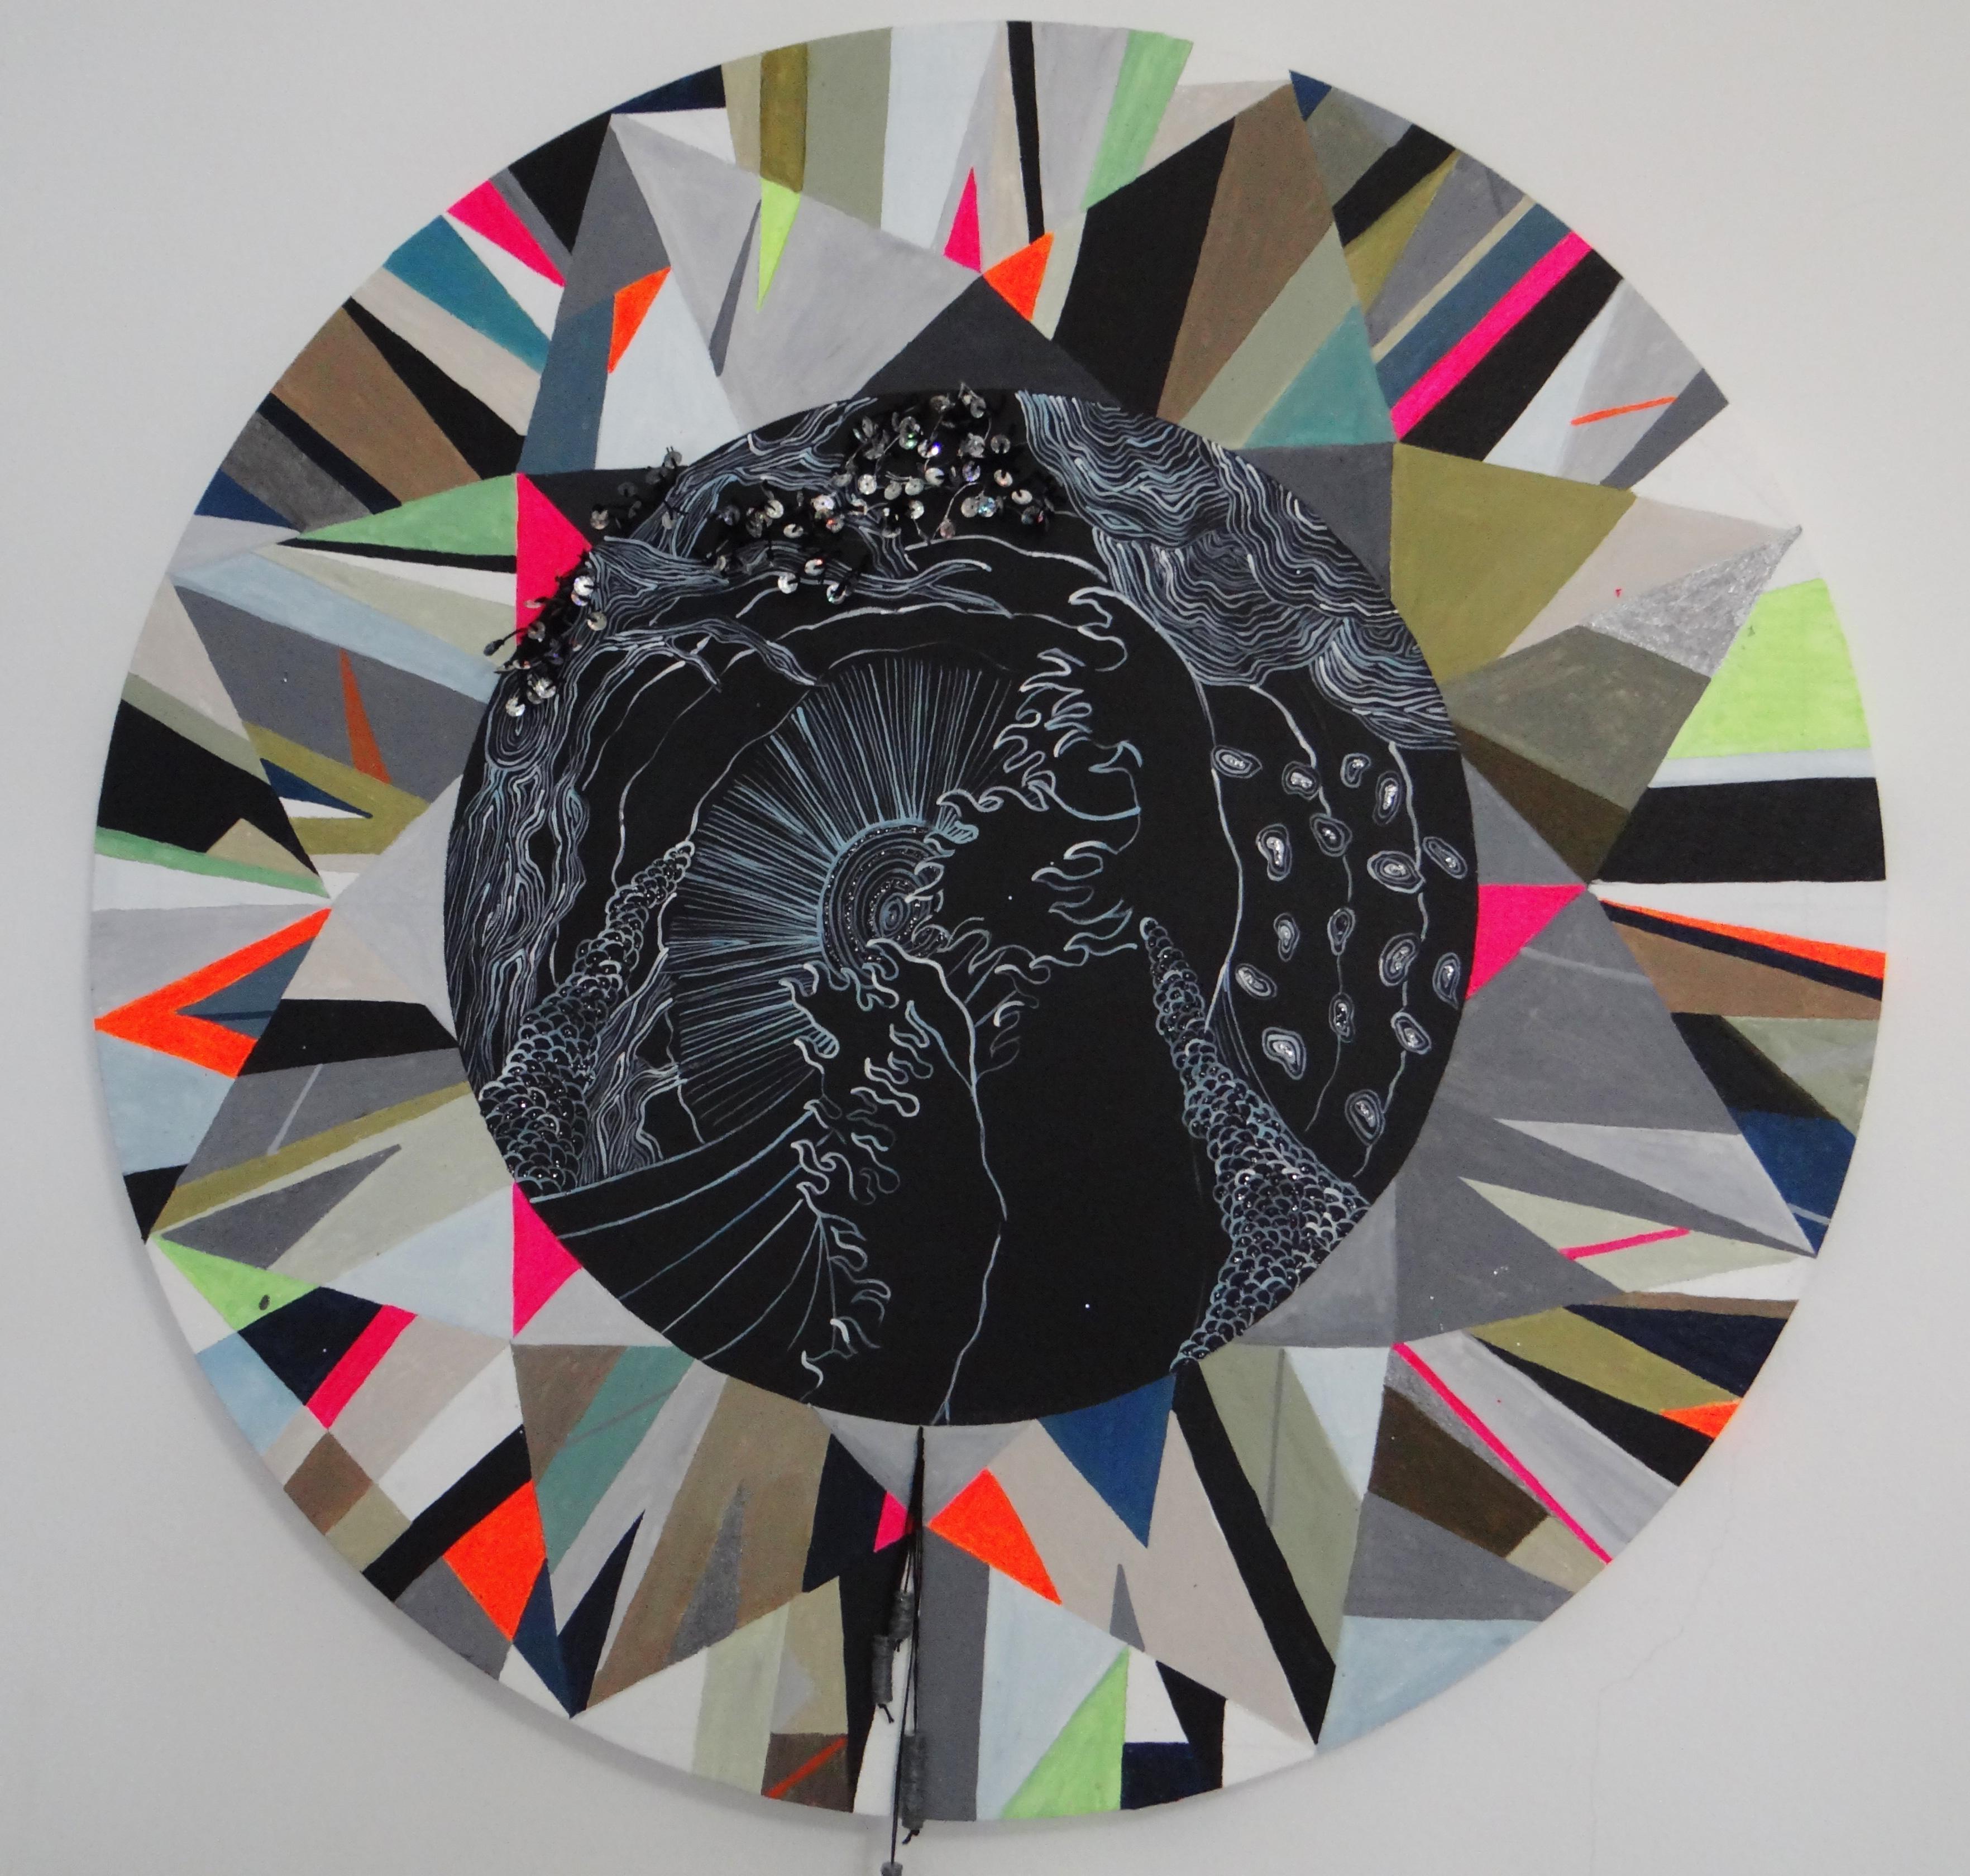 Mijal Zachs Artwork cidades, 2010 Mixed Media Sculpture, Undecided